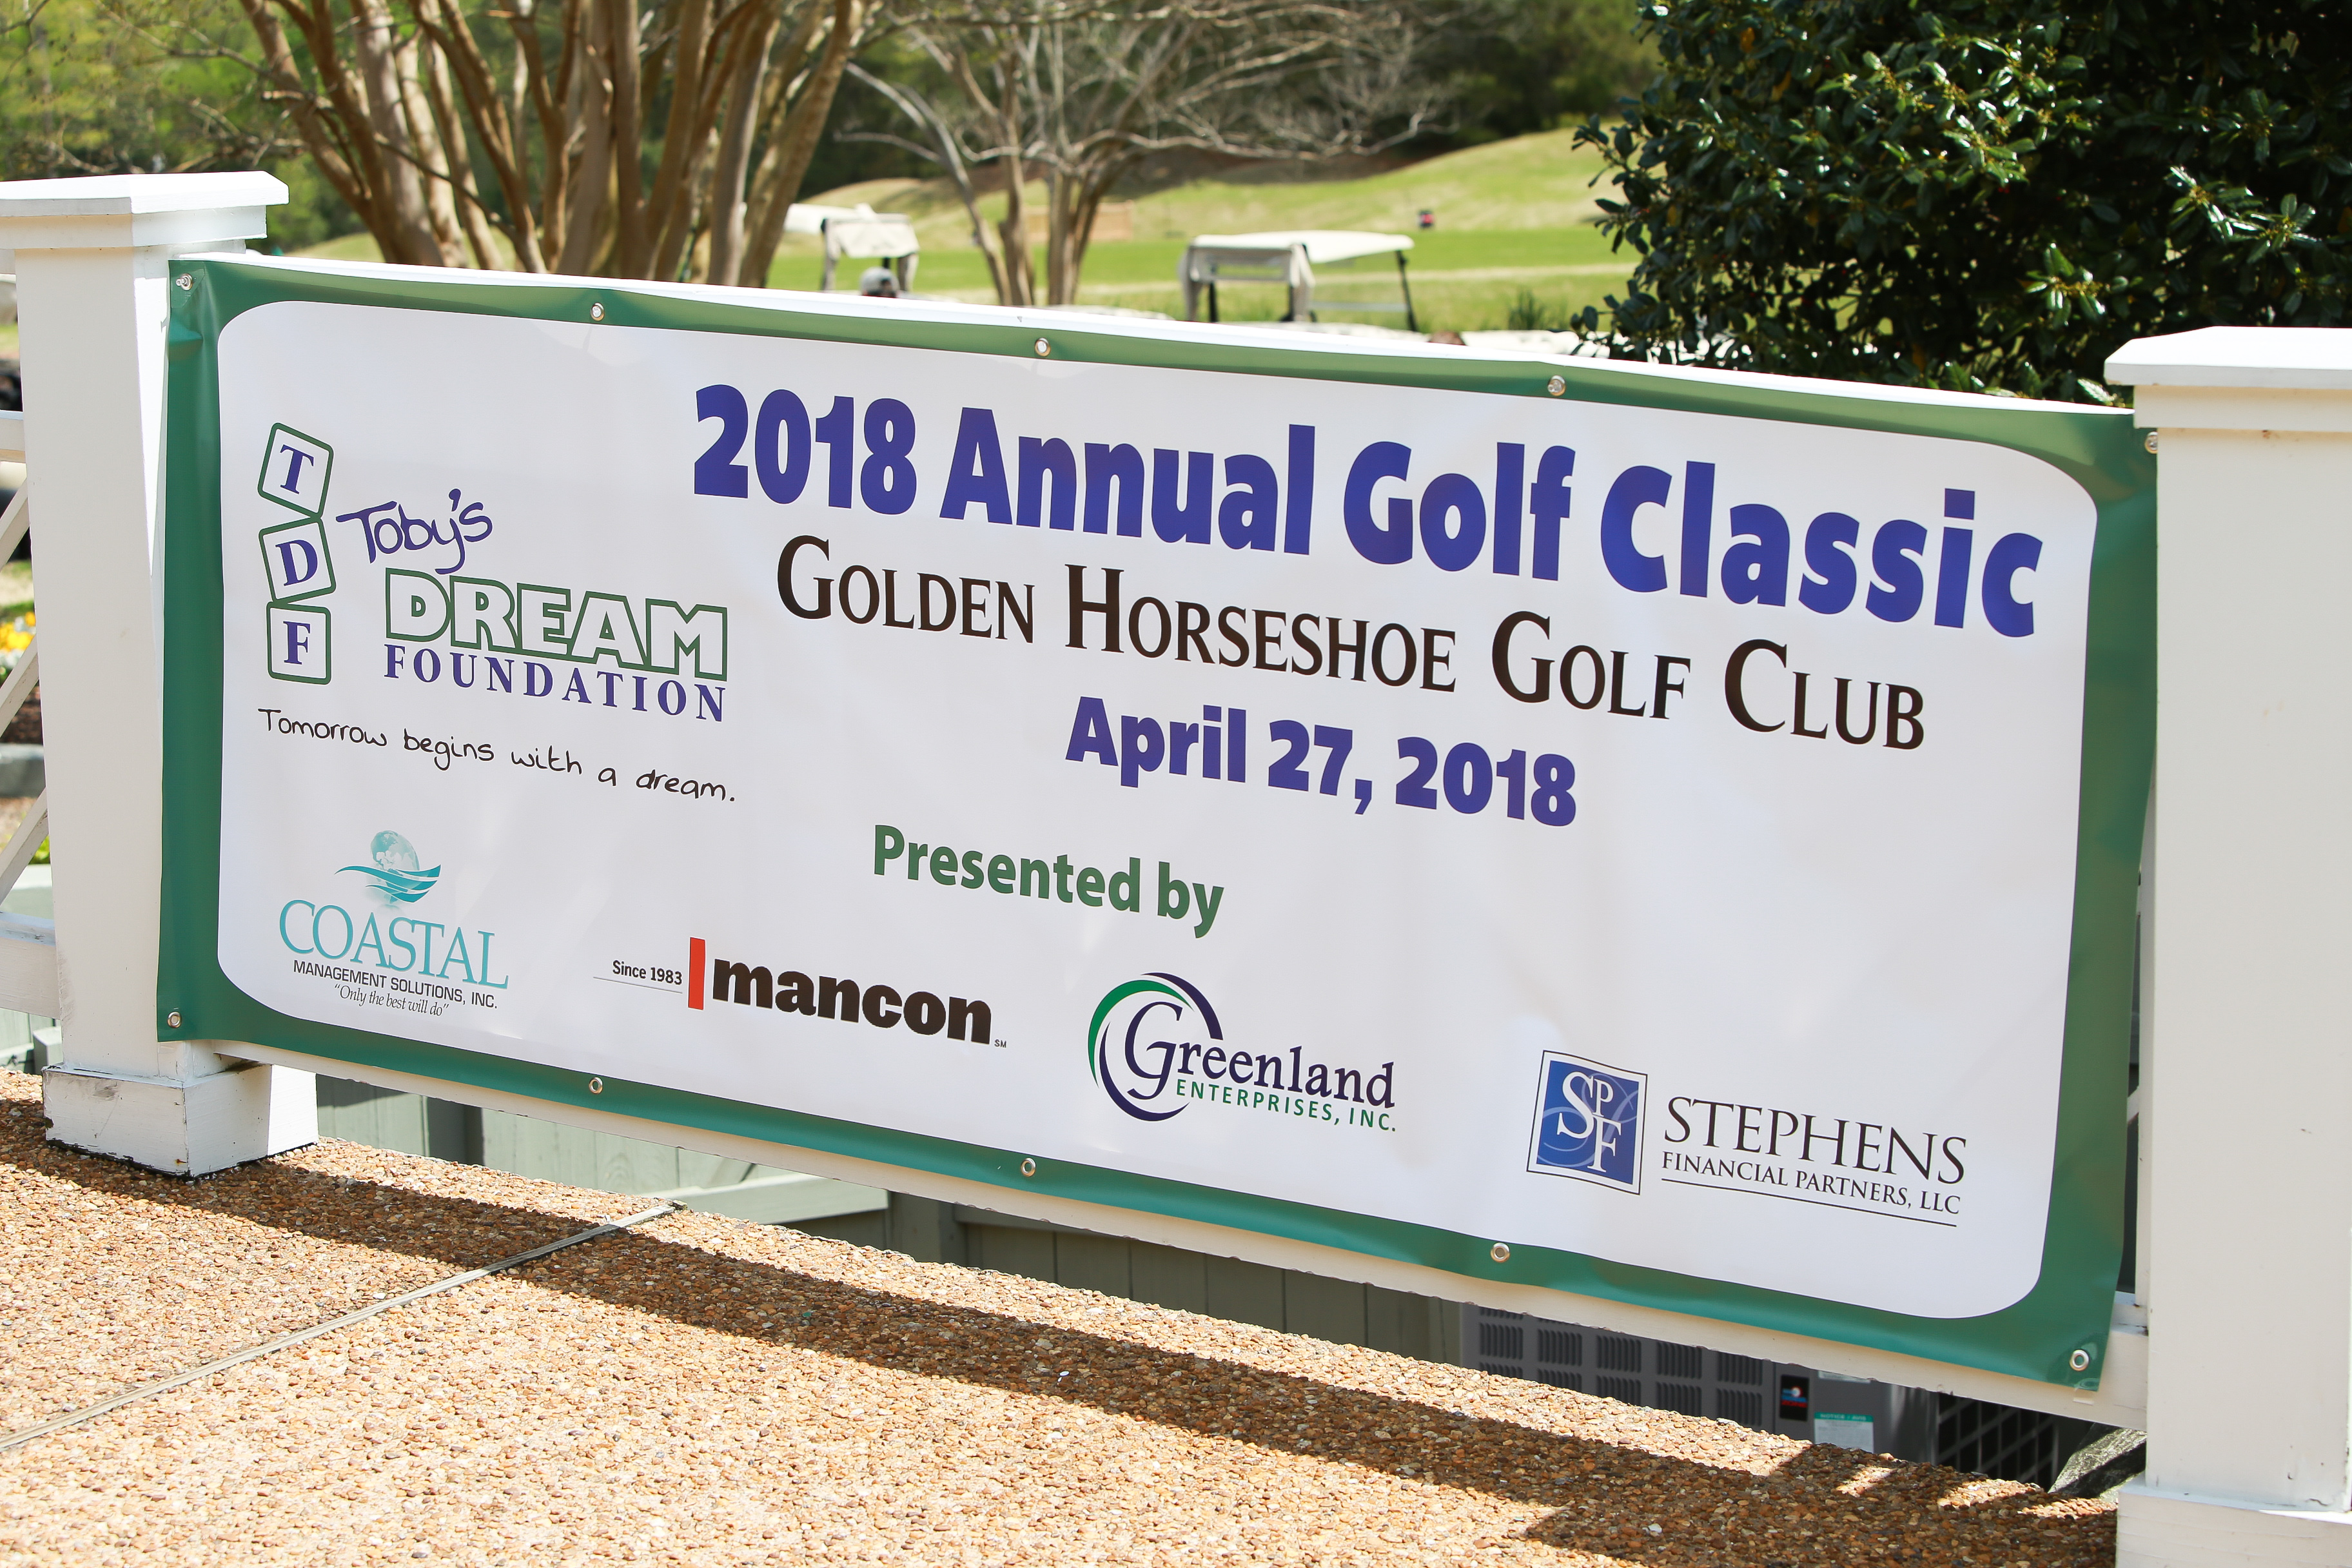 Dream Foundation's 6th Annual Golf Classic 4.27.18